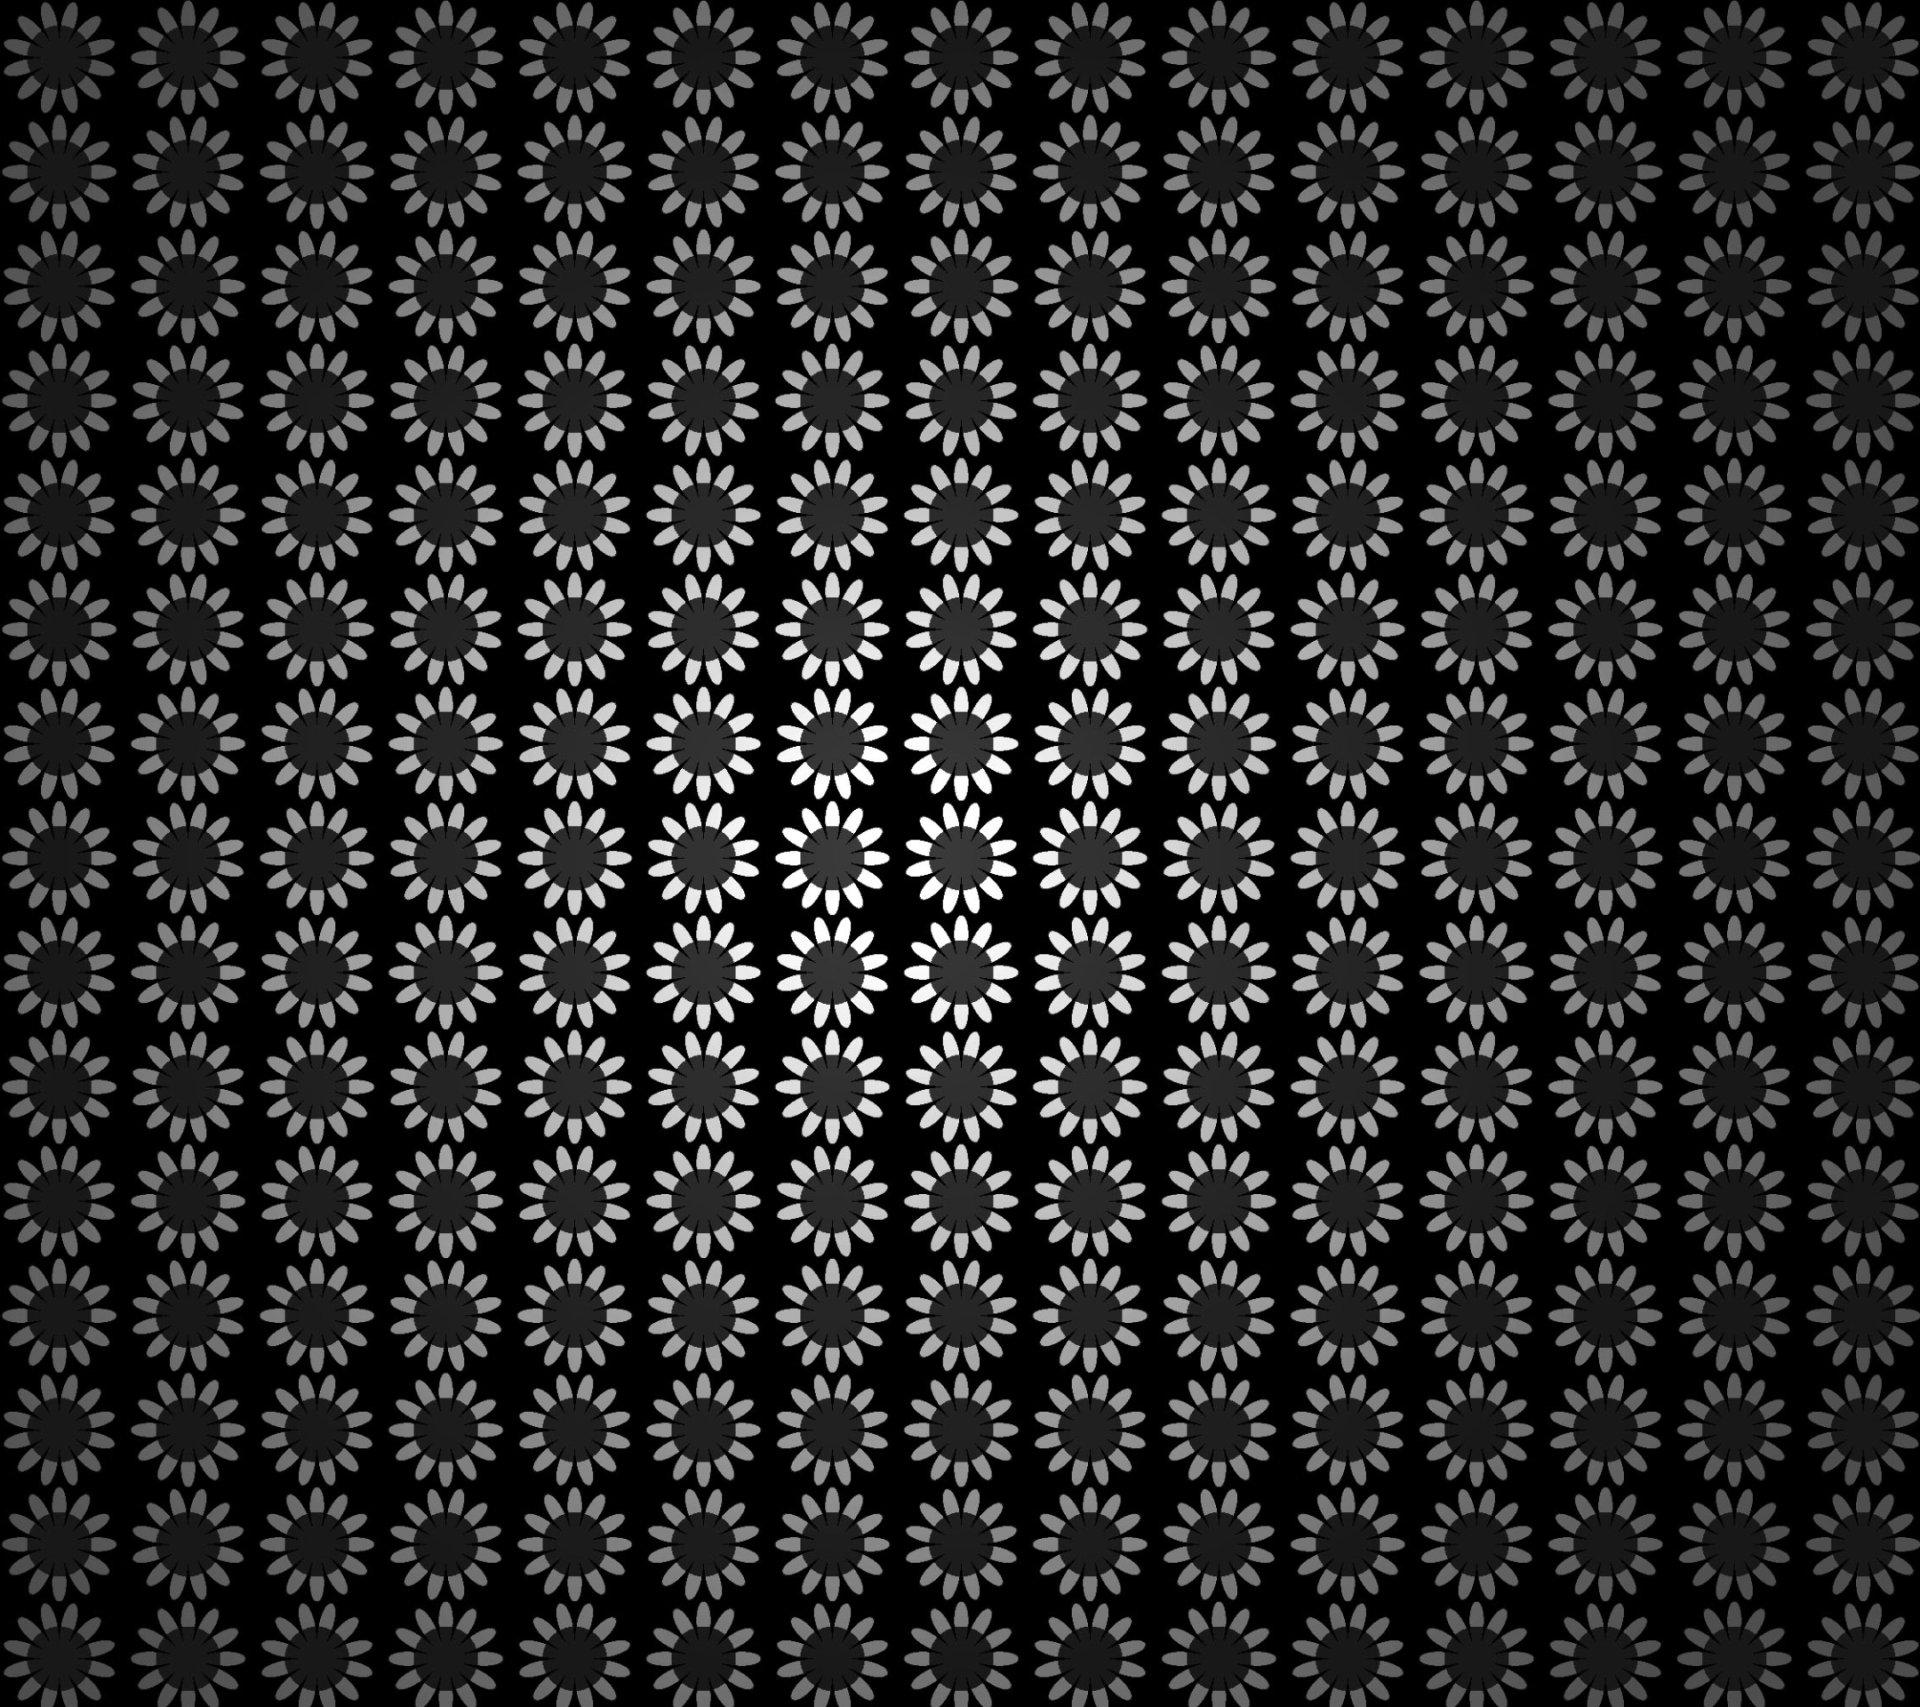 Wallpaper 790400